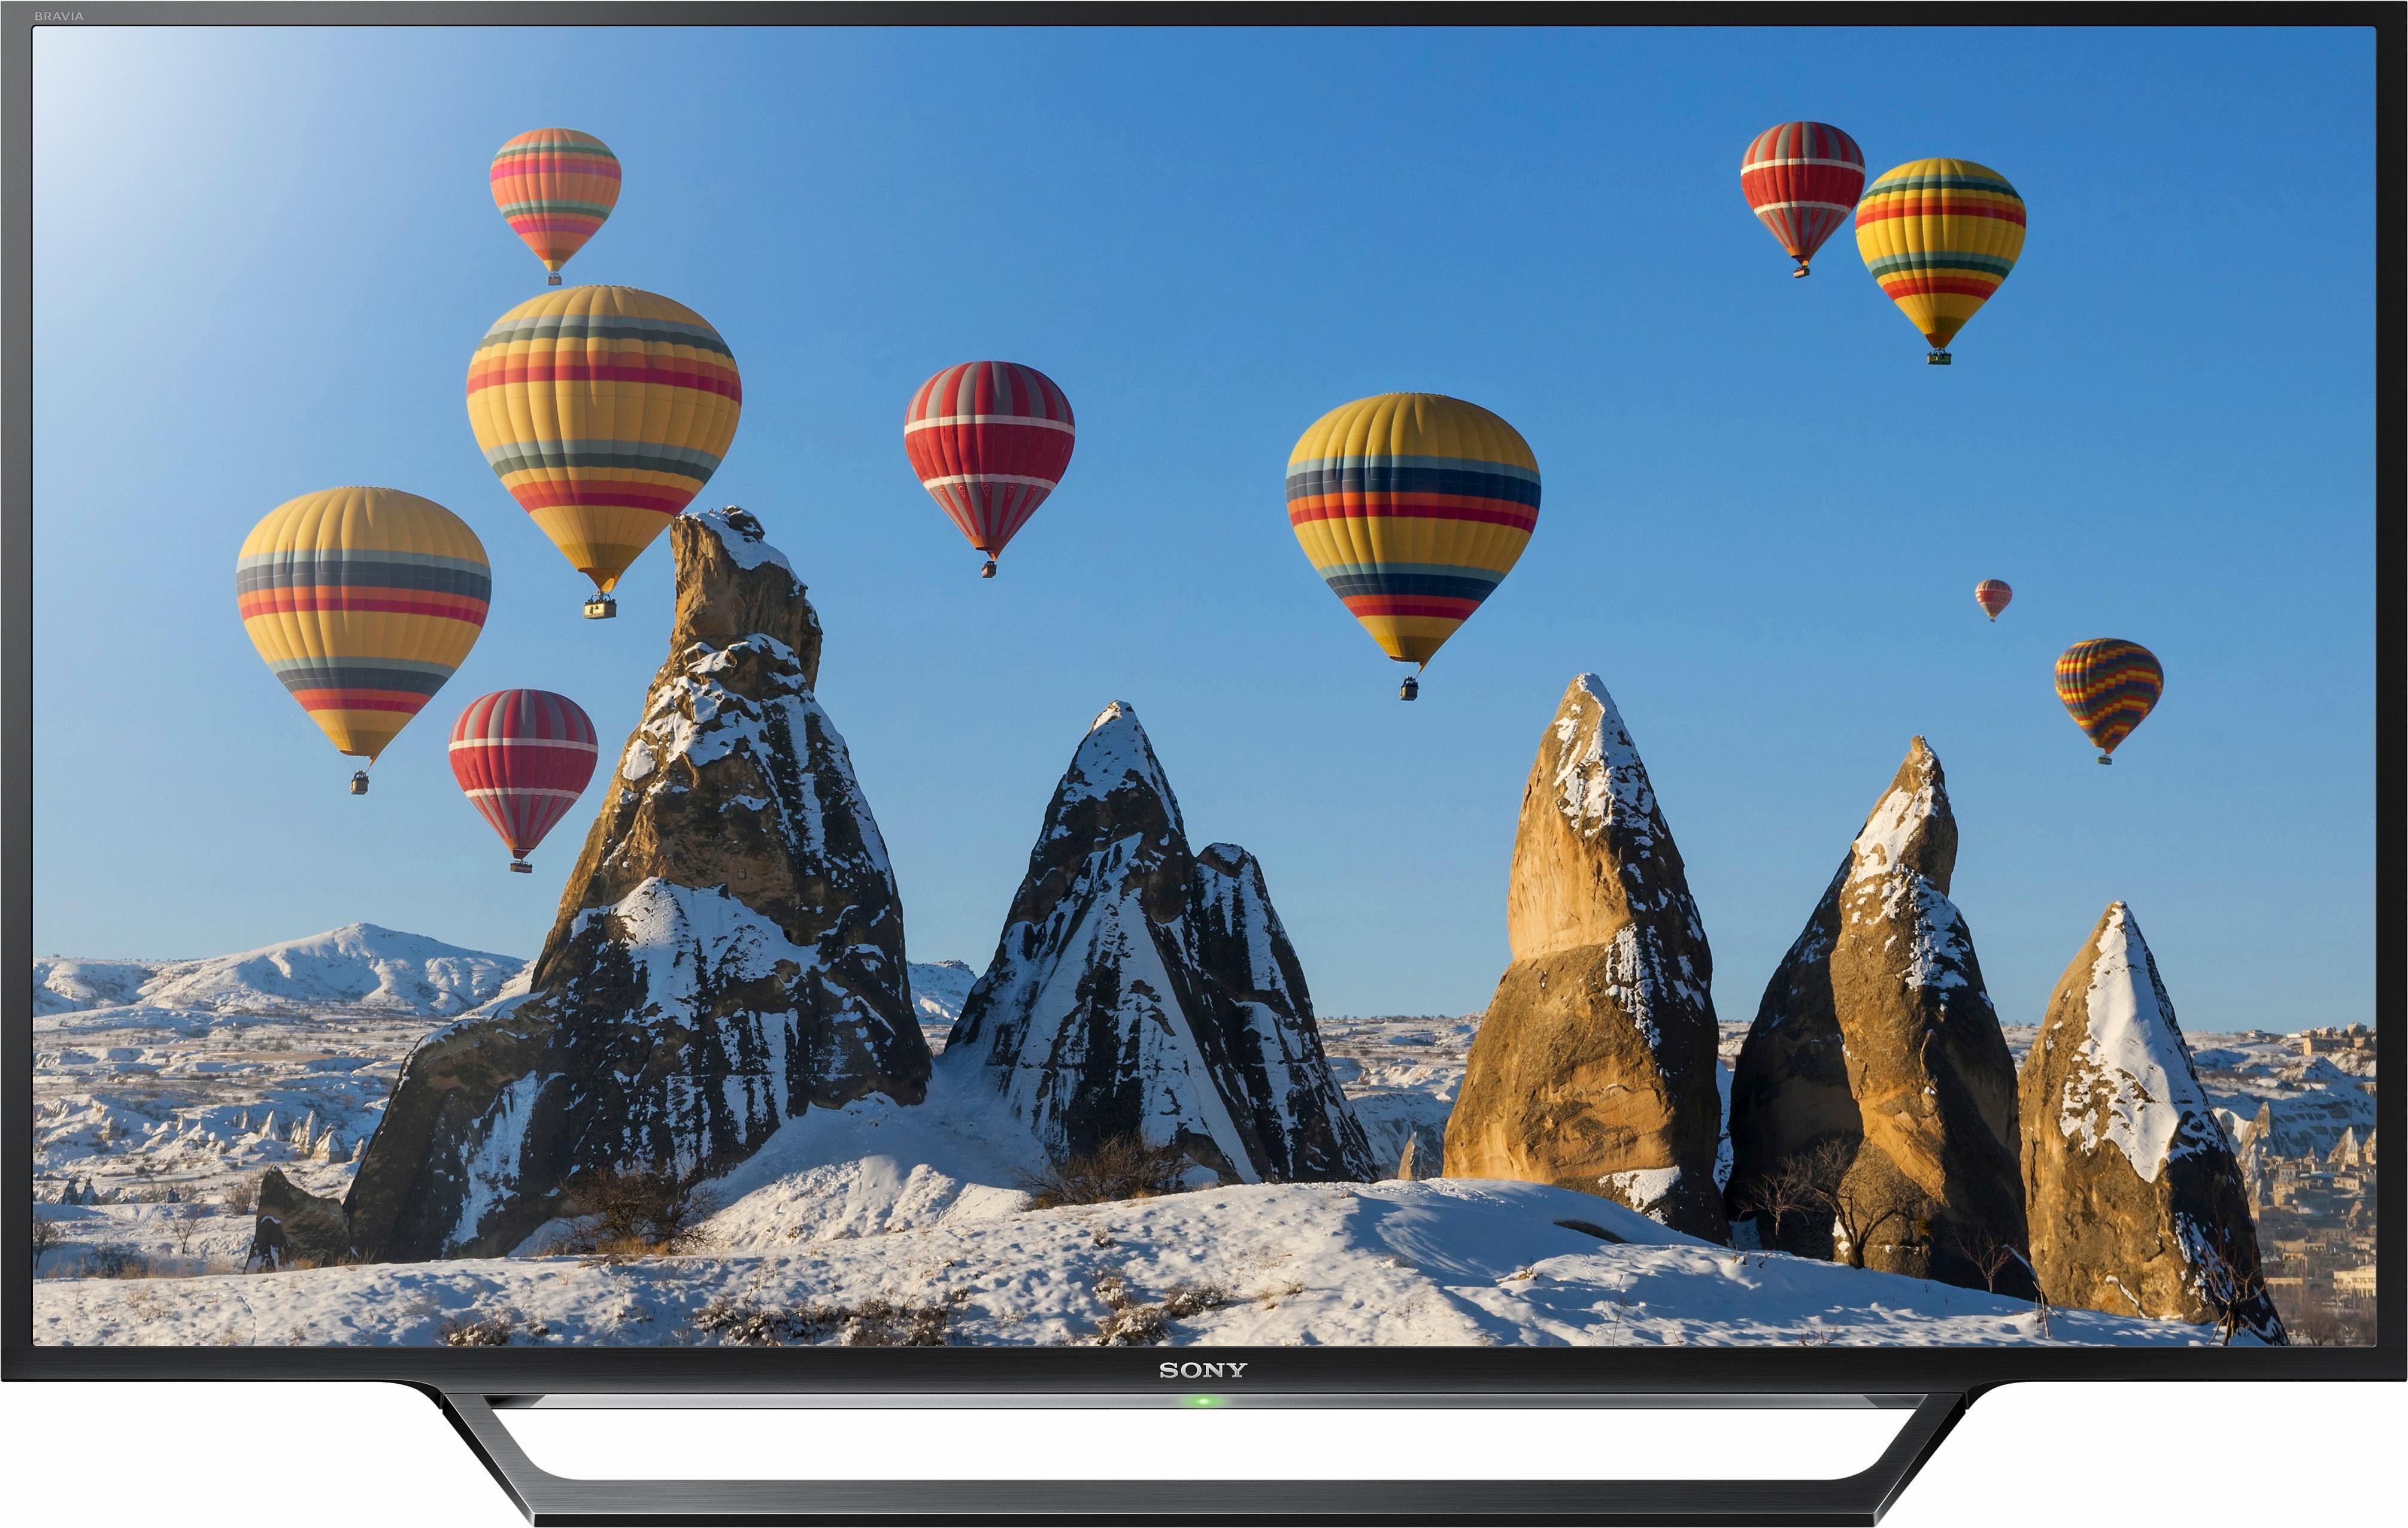 Sony BRAVIA KDL-48WD655, LED Fernseher, 121 cm (48 Zoll), 1080p (Full HD), Smart-TV